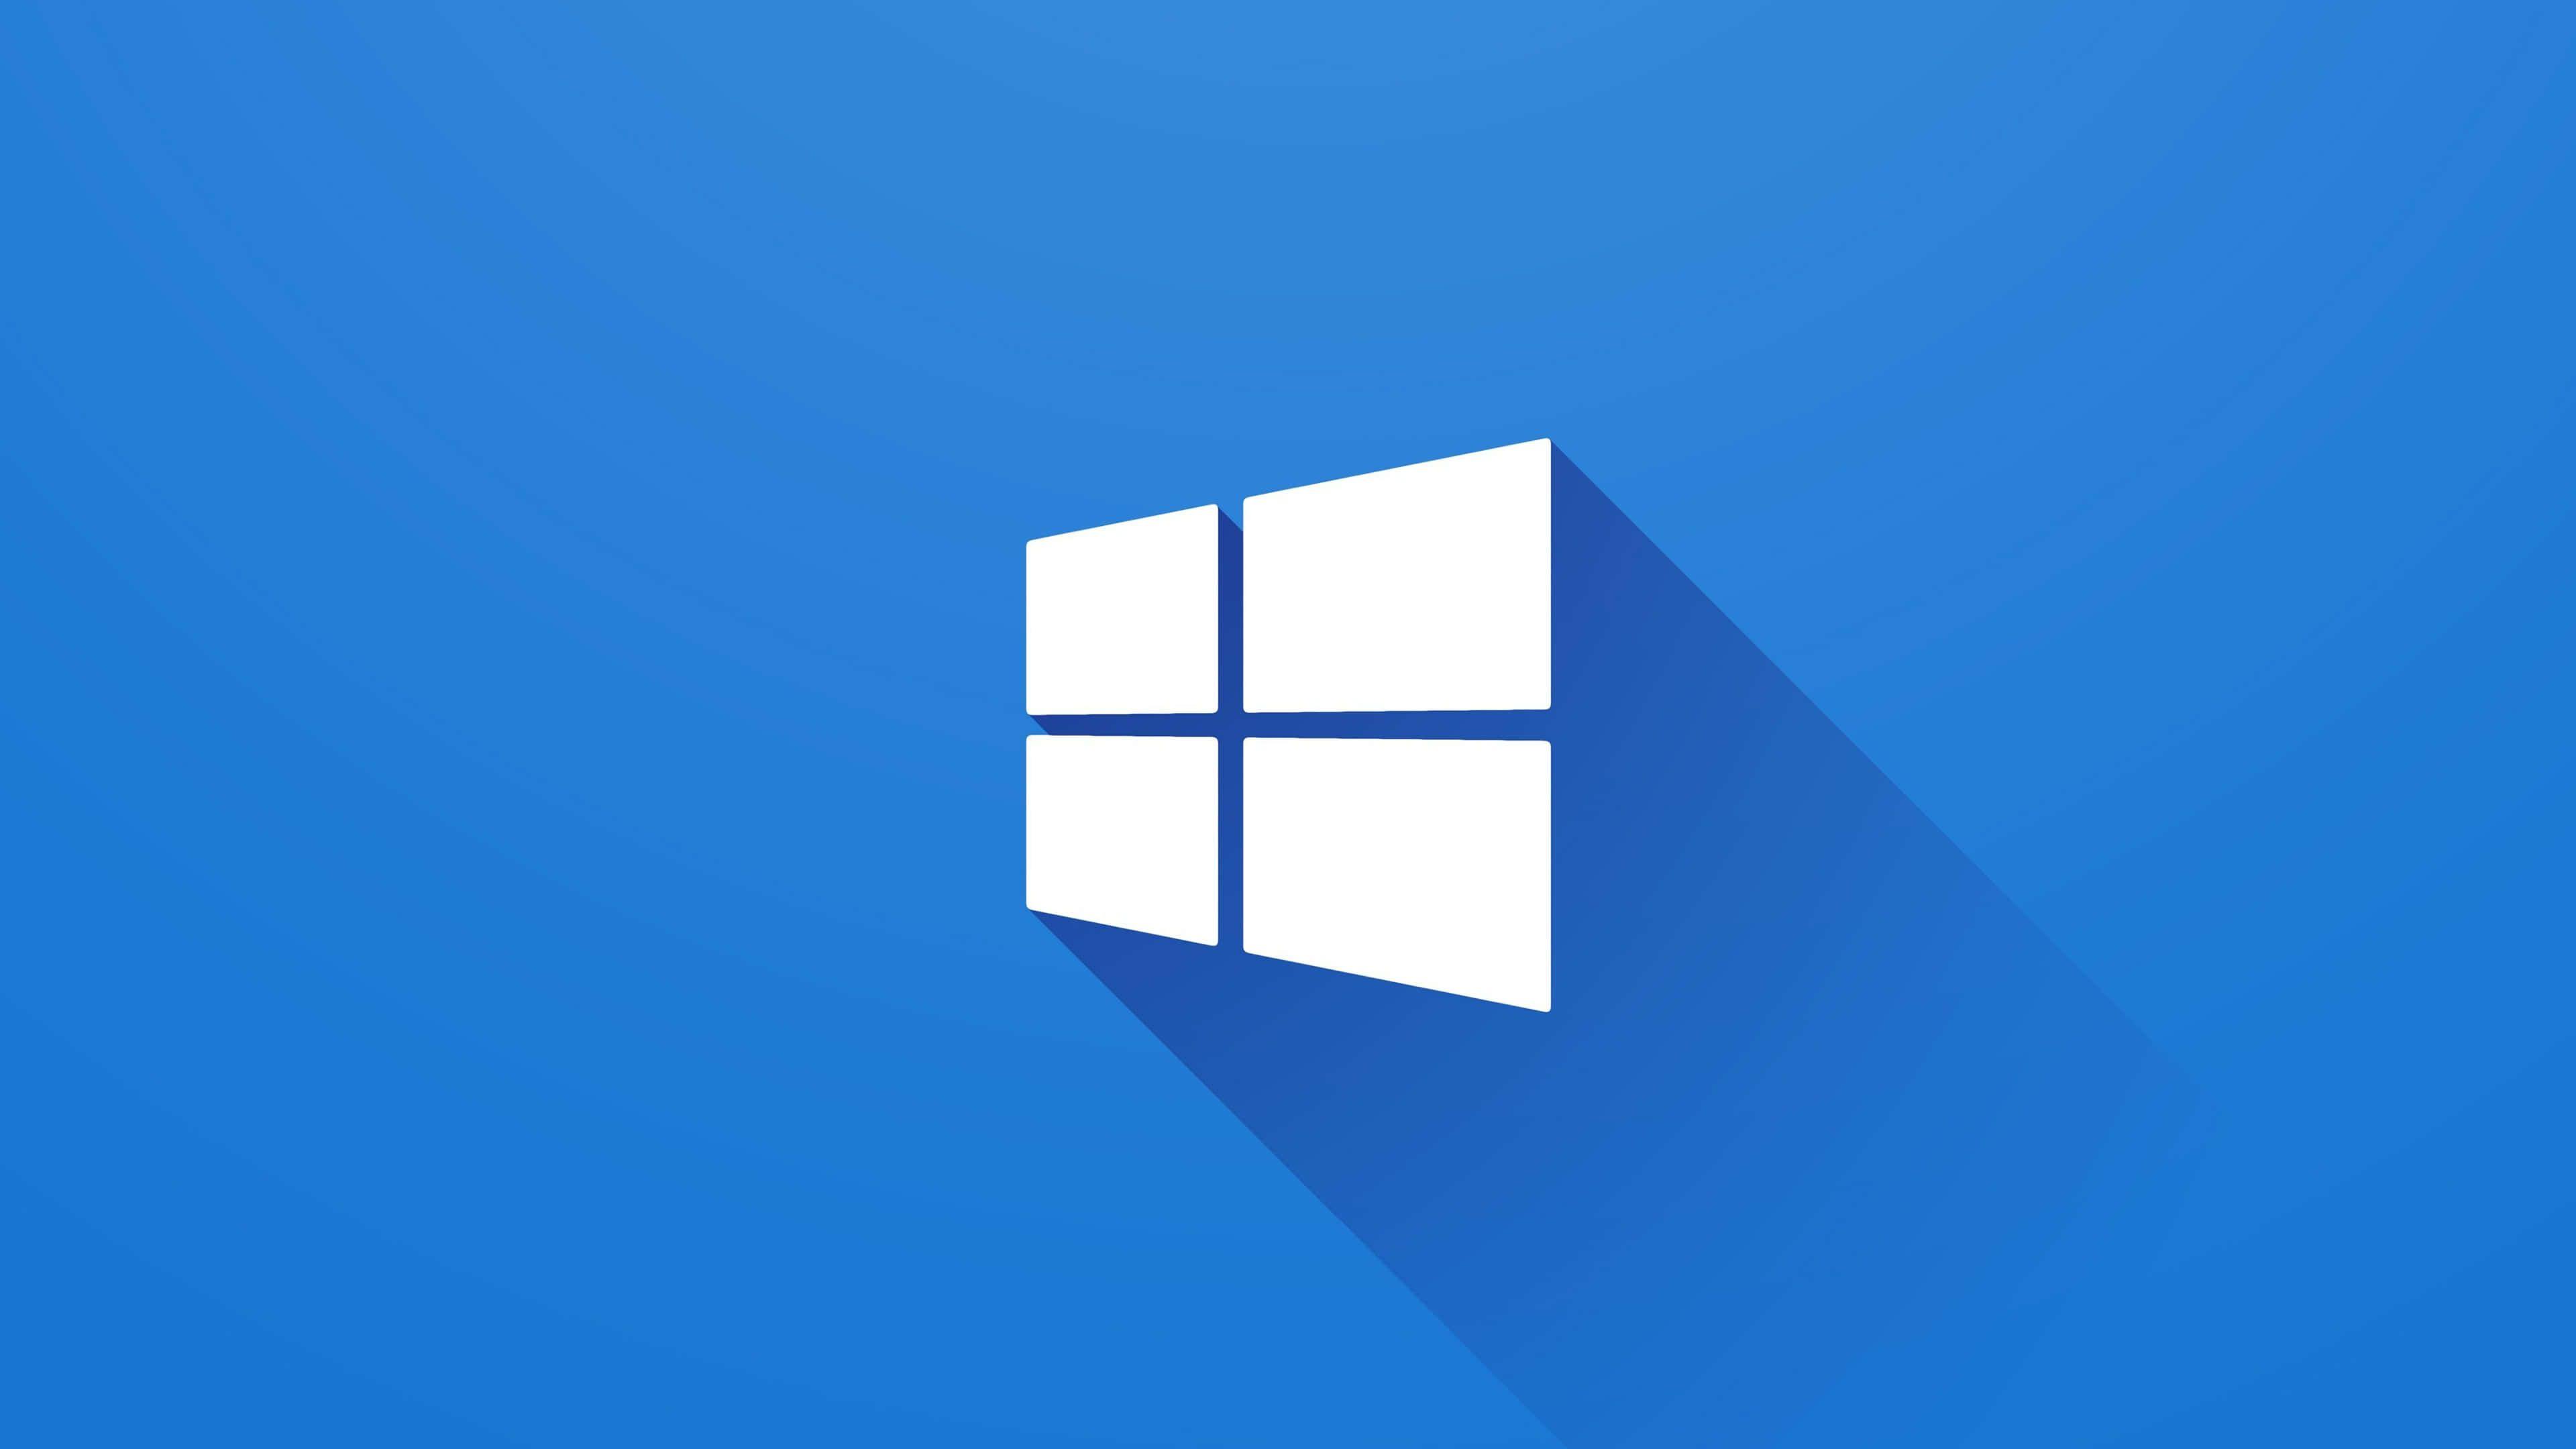 Windows 10 Minimalist Logo Uhd 4k Wallpaper Windows 10 Logo Windows 10 Microsoft